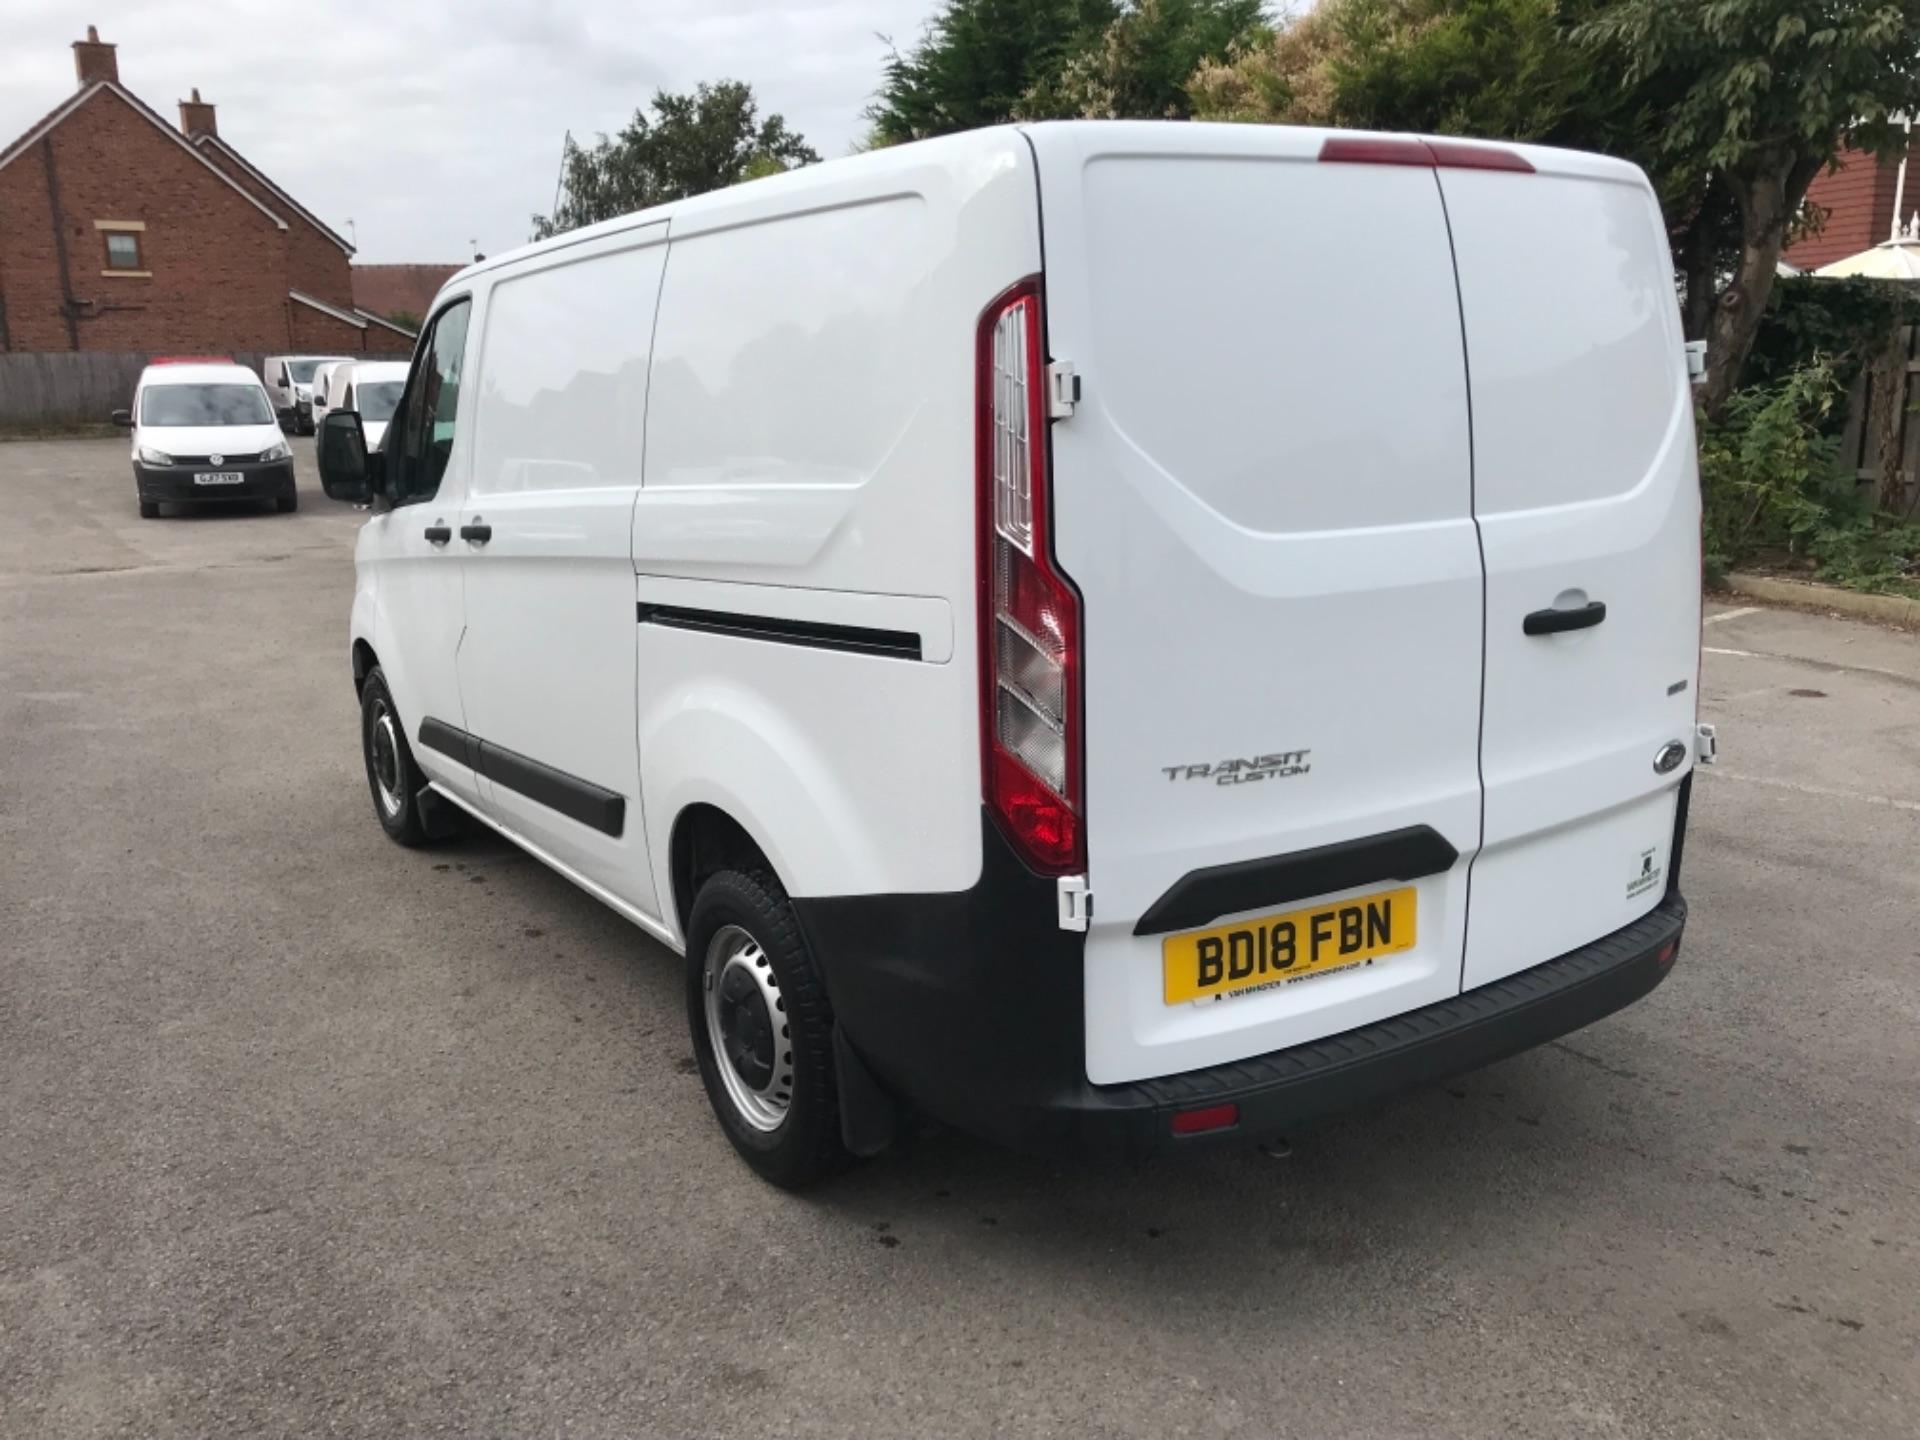 2018 Ford Transit Custom 2.0 Tdci 105Ps Low Roof Van Euro 6 (BD18FBN) Image 5